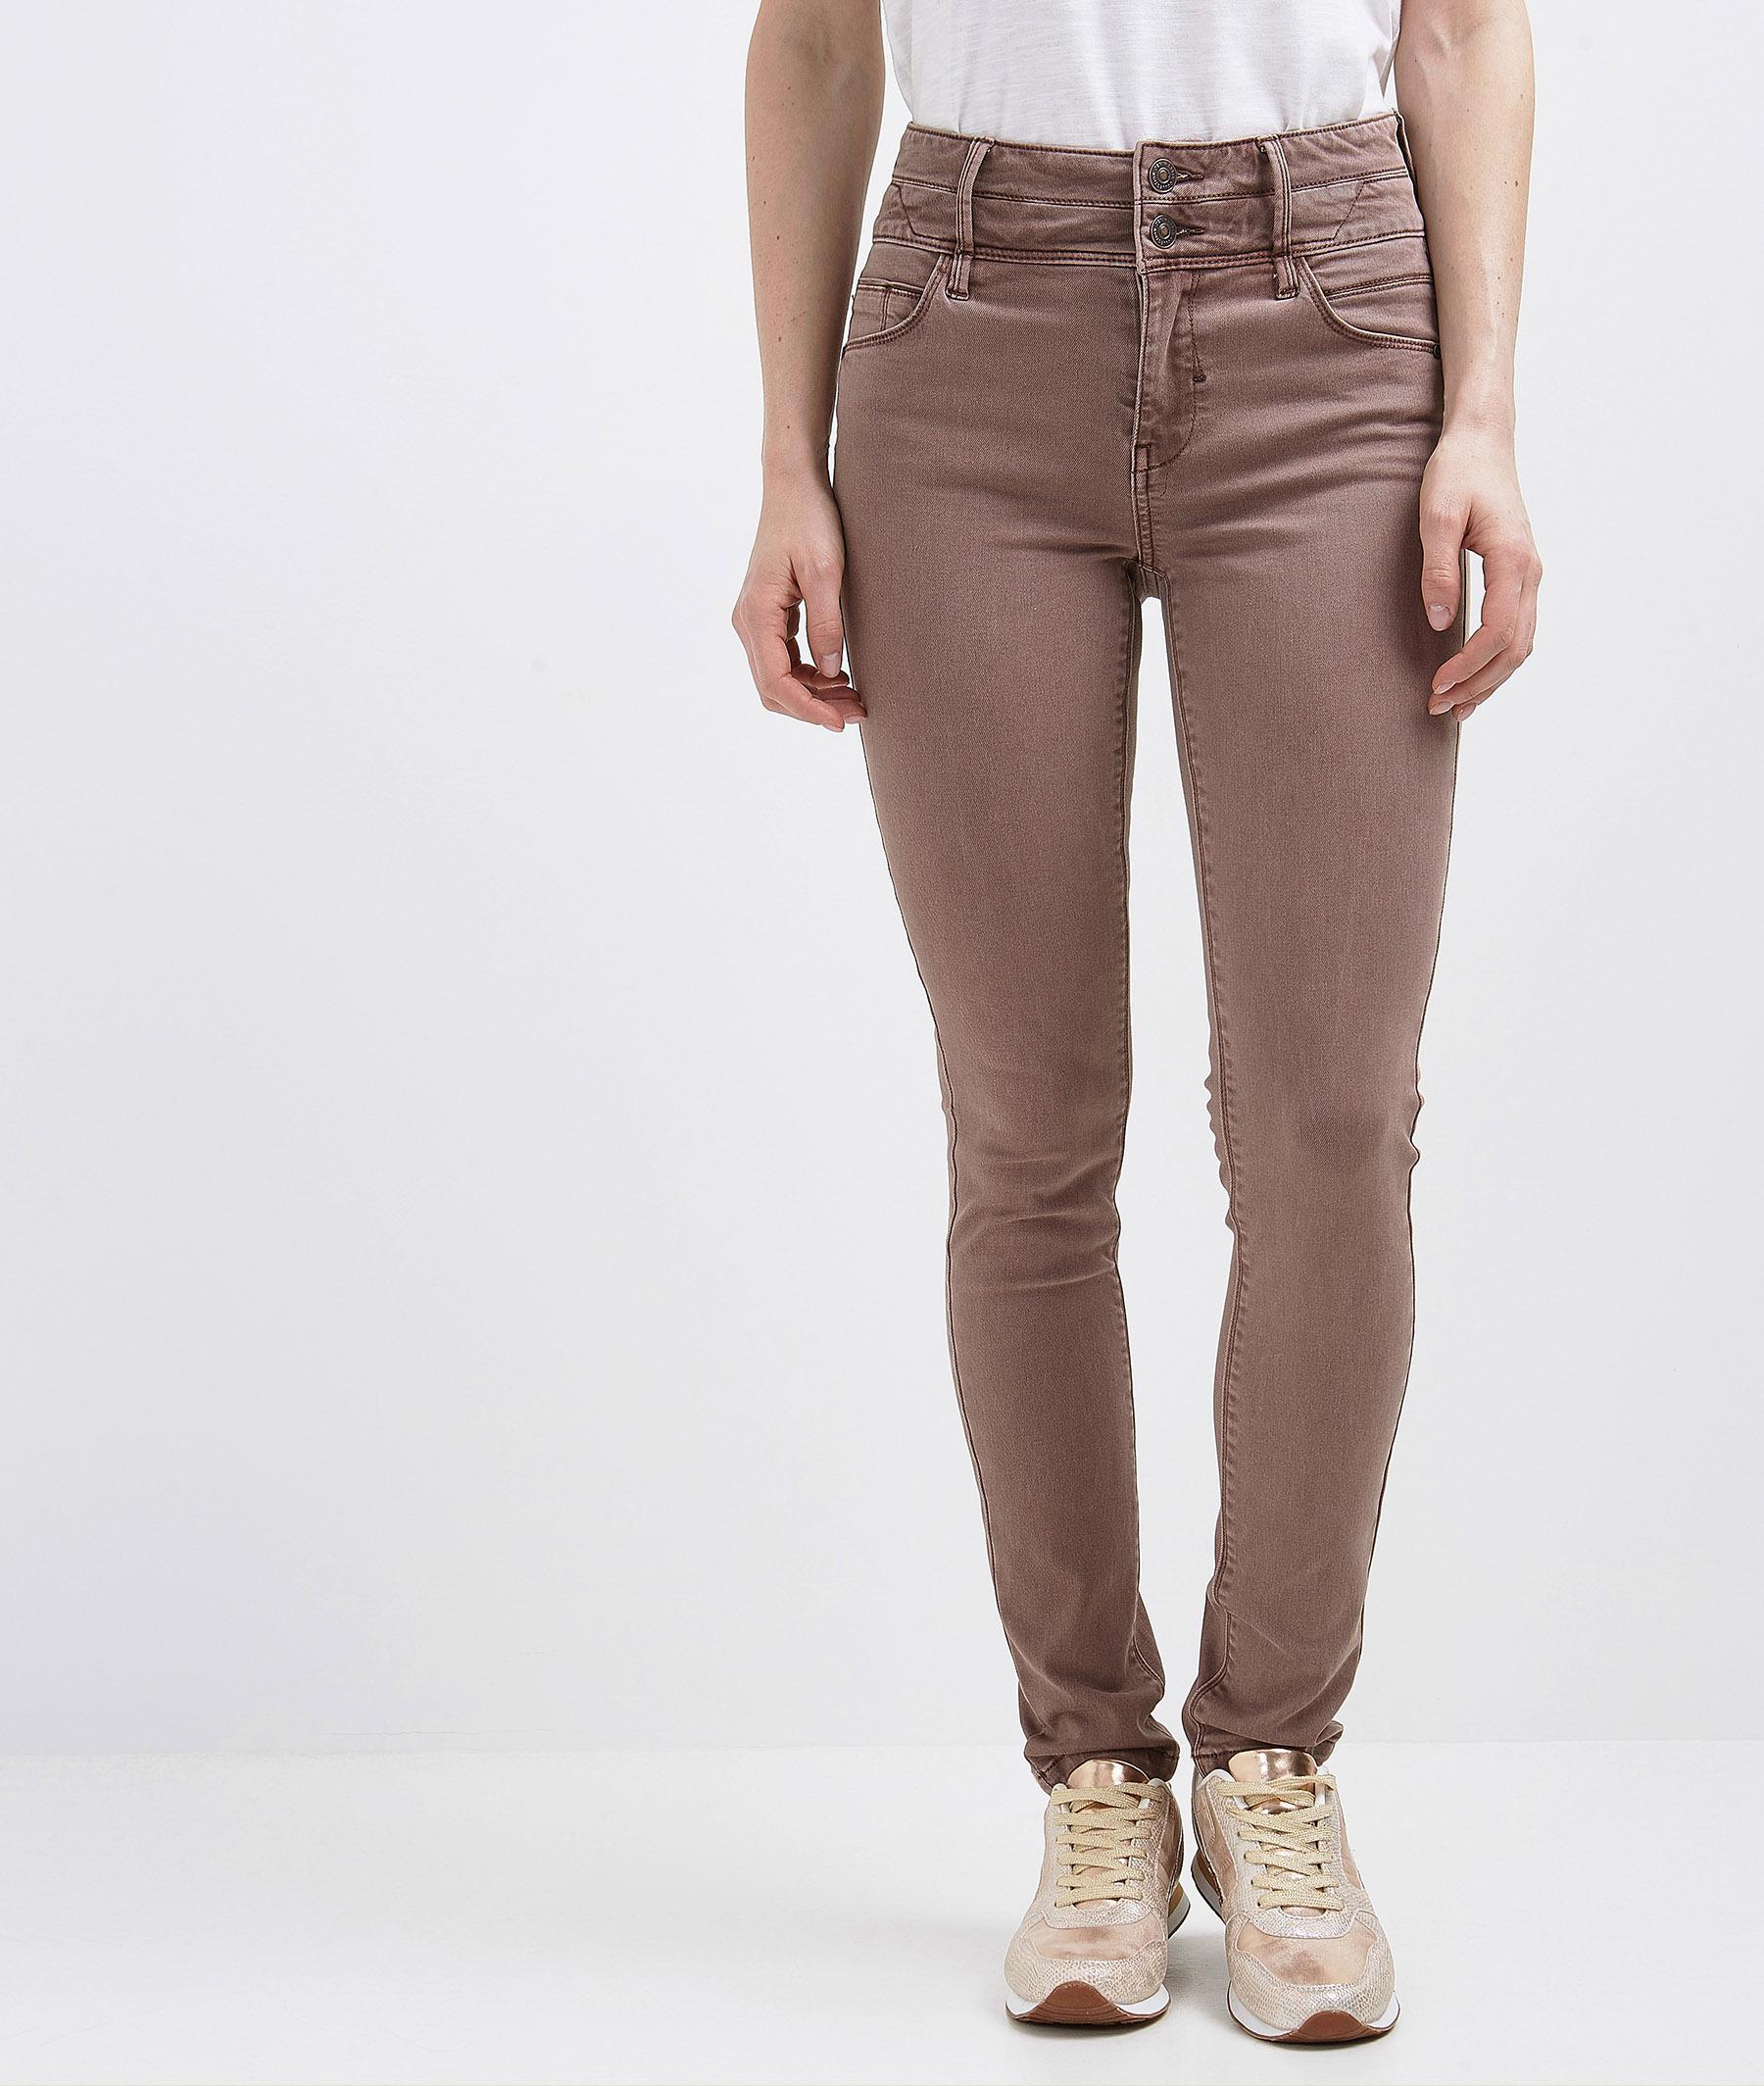 Pantalon femme slim taille haute IRIS